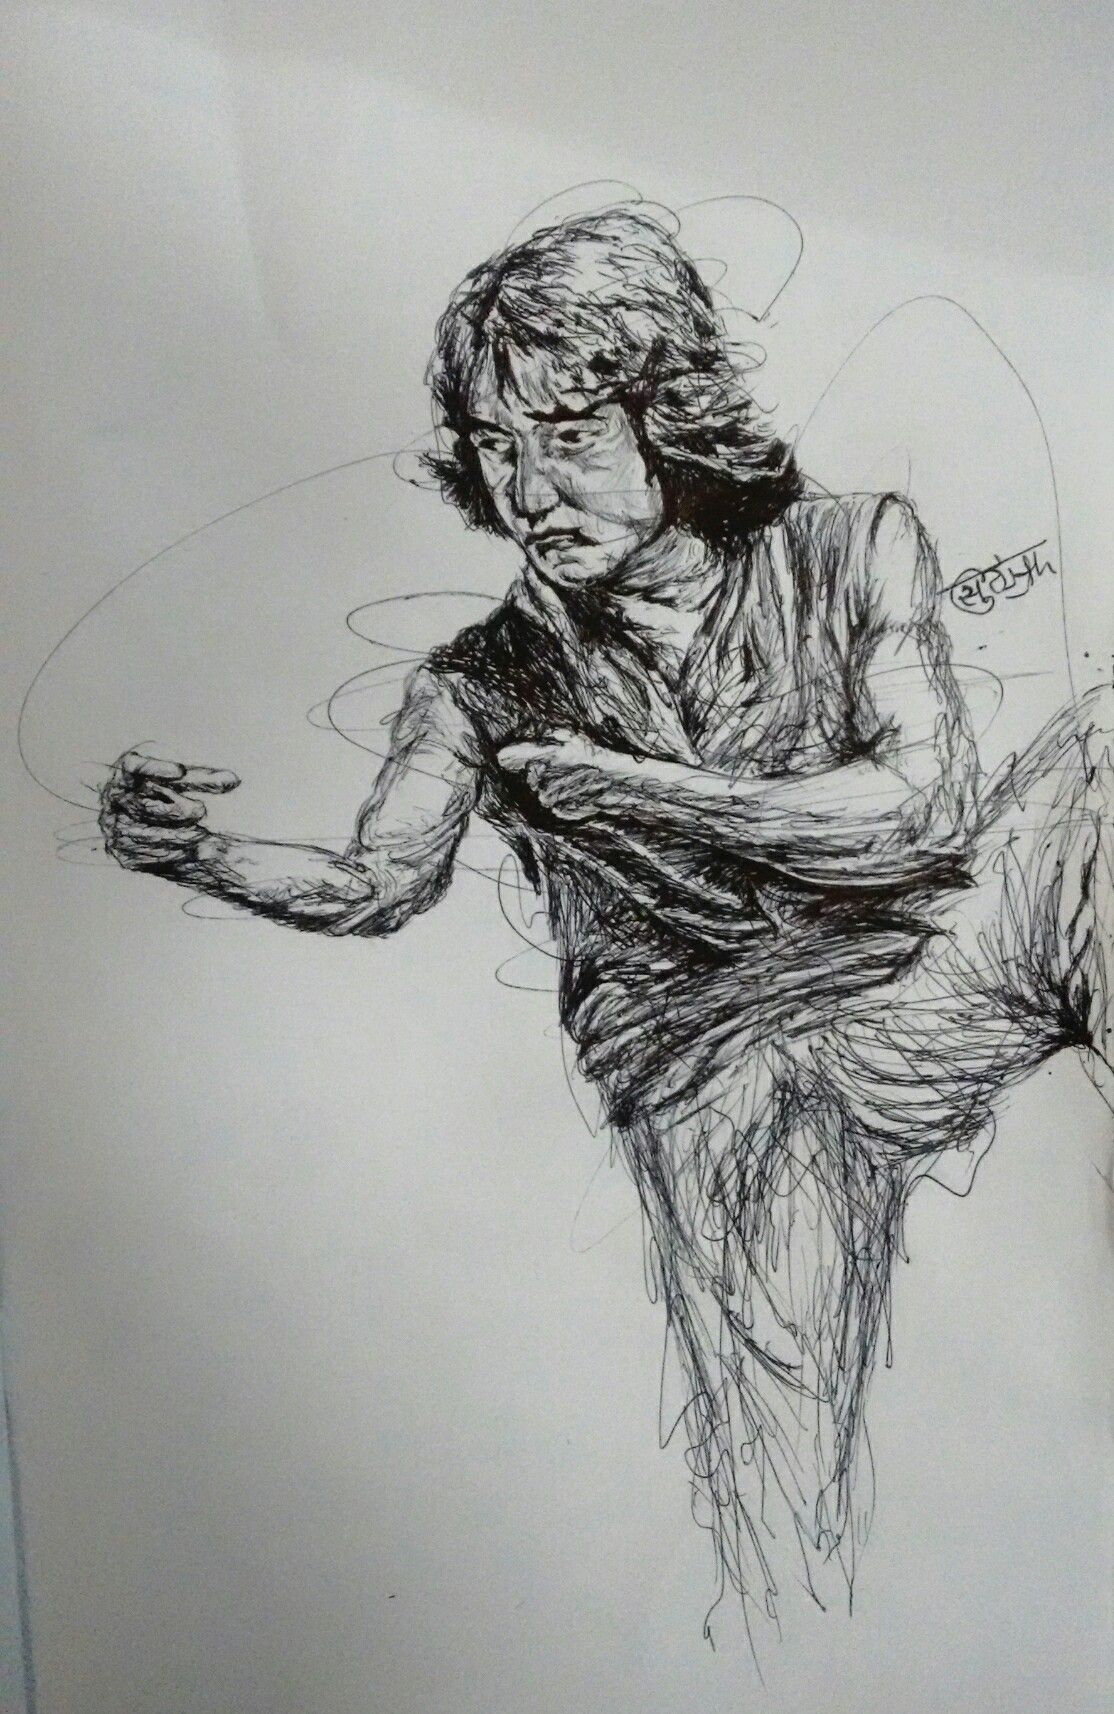 Scribble Drawing Uk : Drunken master scribble drawing of jackie chan by